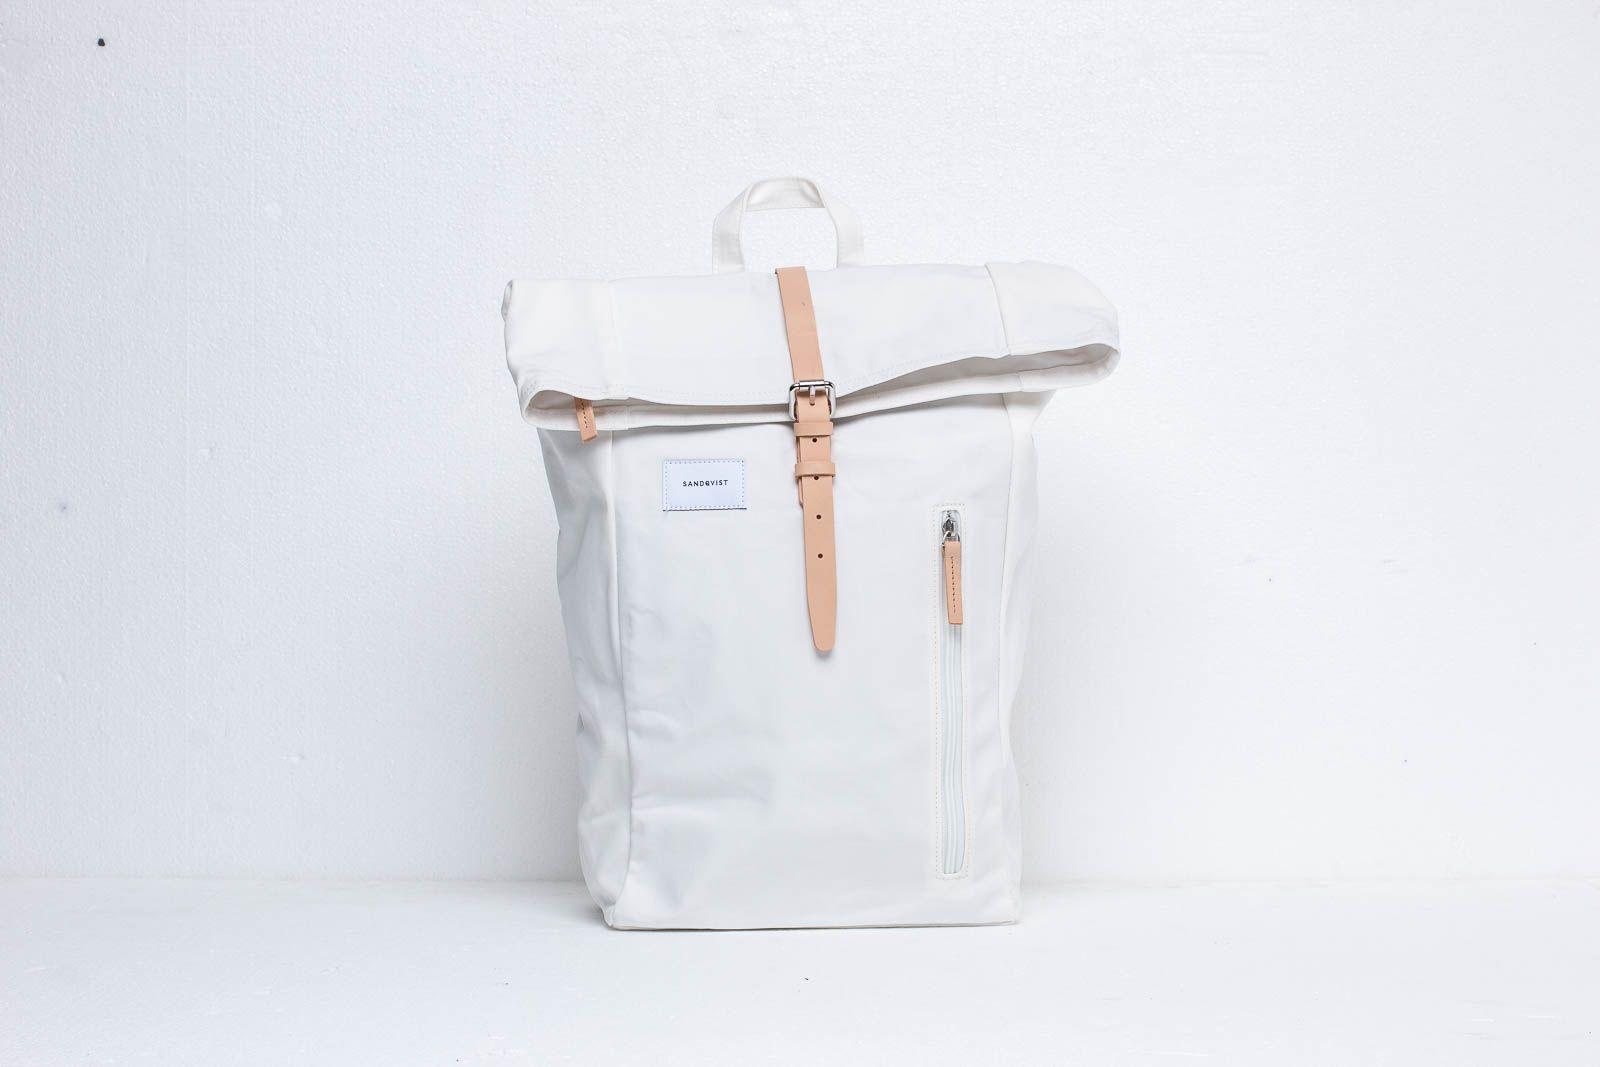 SANDQVIST Dante Backpack Off-White za skvelú cenu 114 € kúpite na Footshop.sk